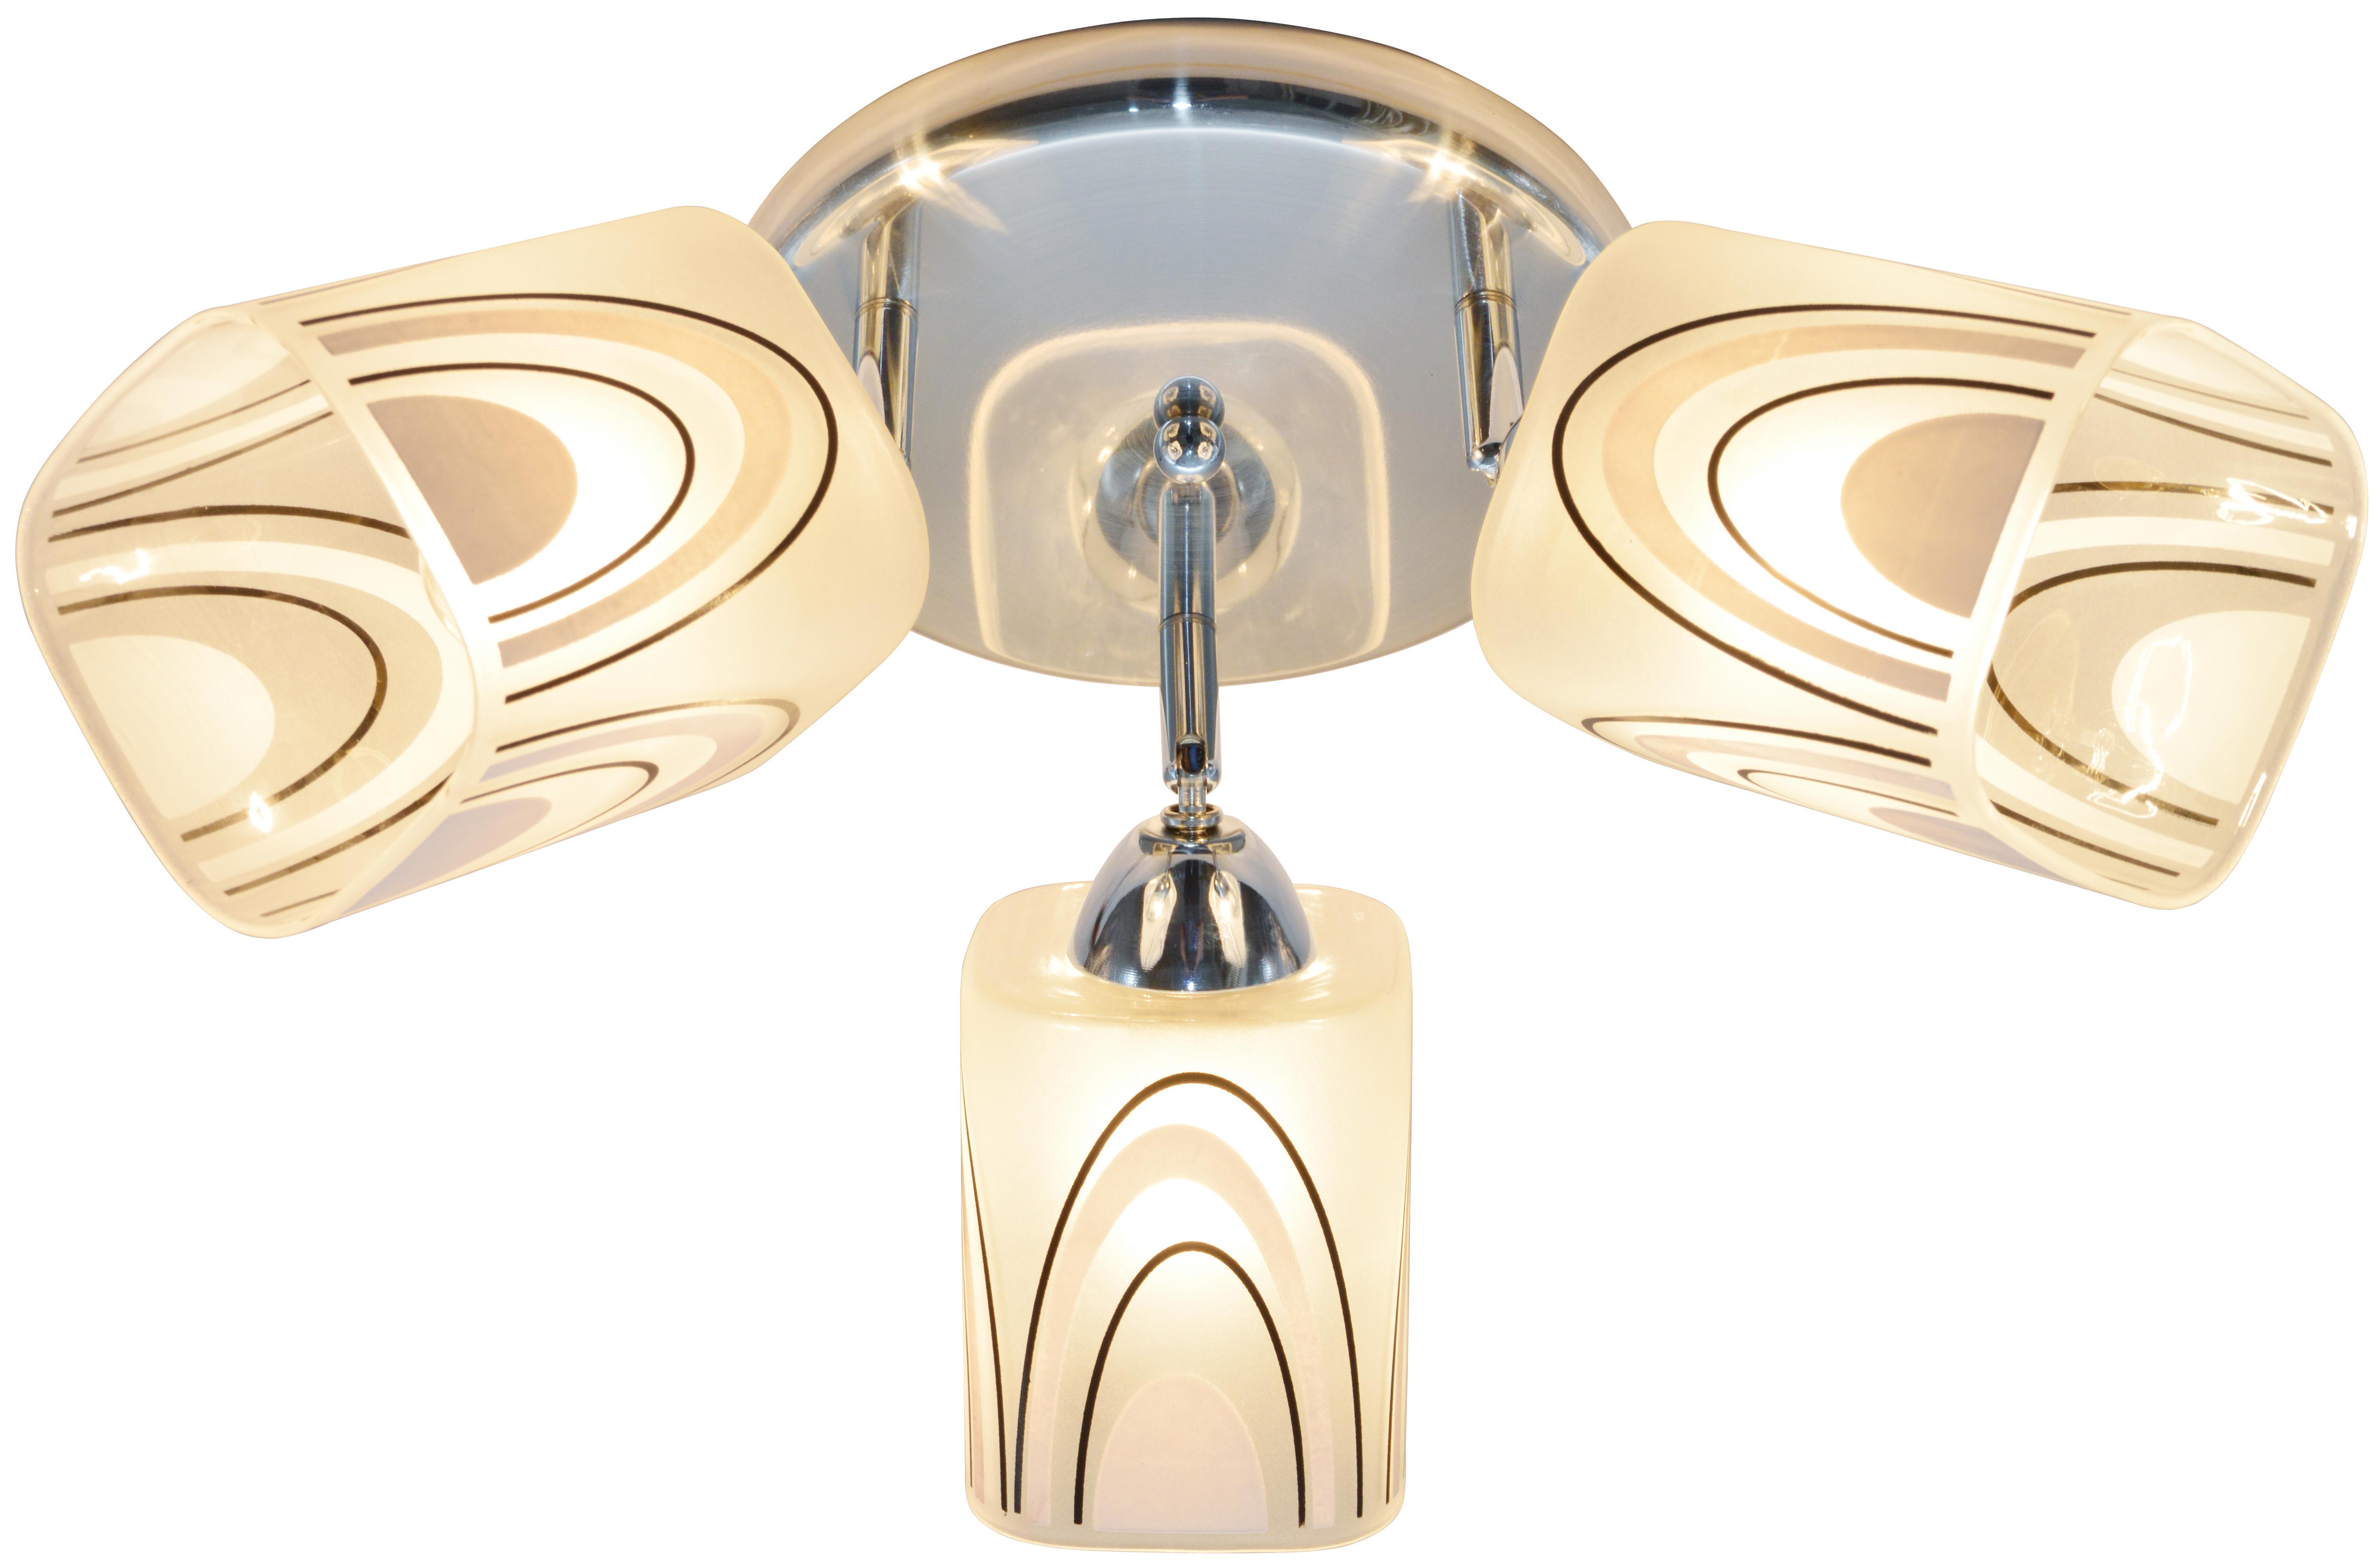 Люстра Lamplandia L1033-3 linda люстра lamplandia 3830 sprite